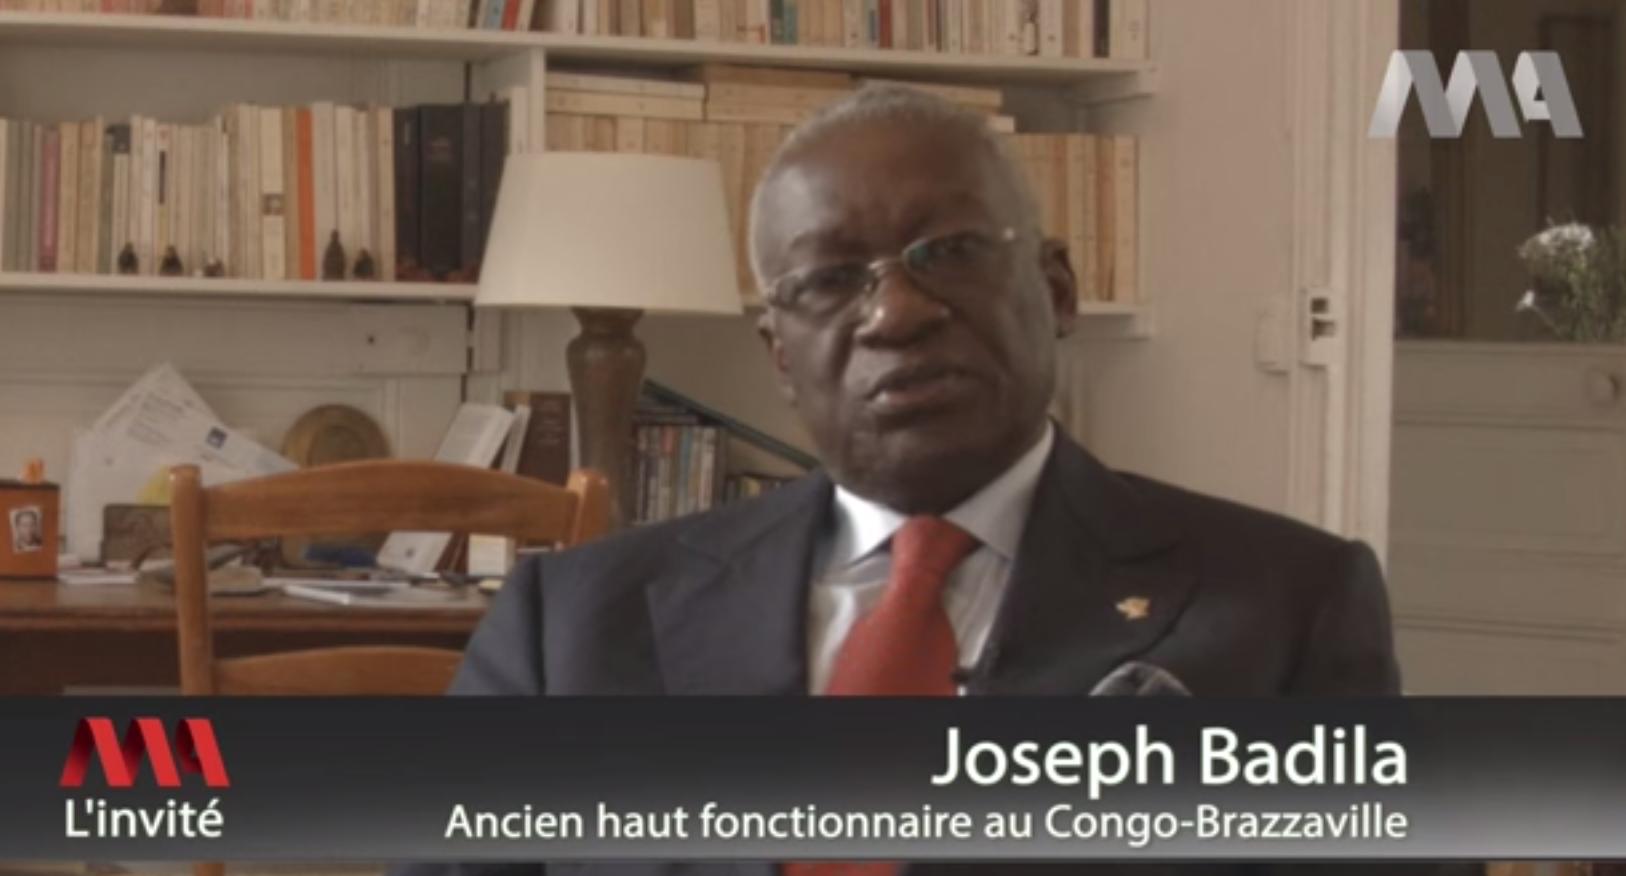 Joseph Badila